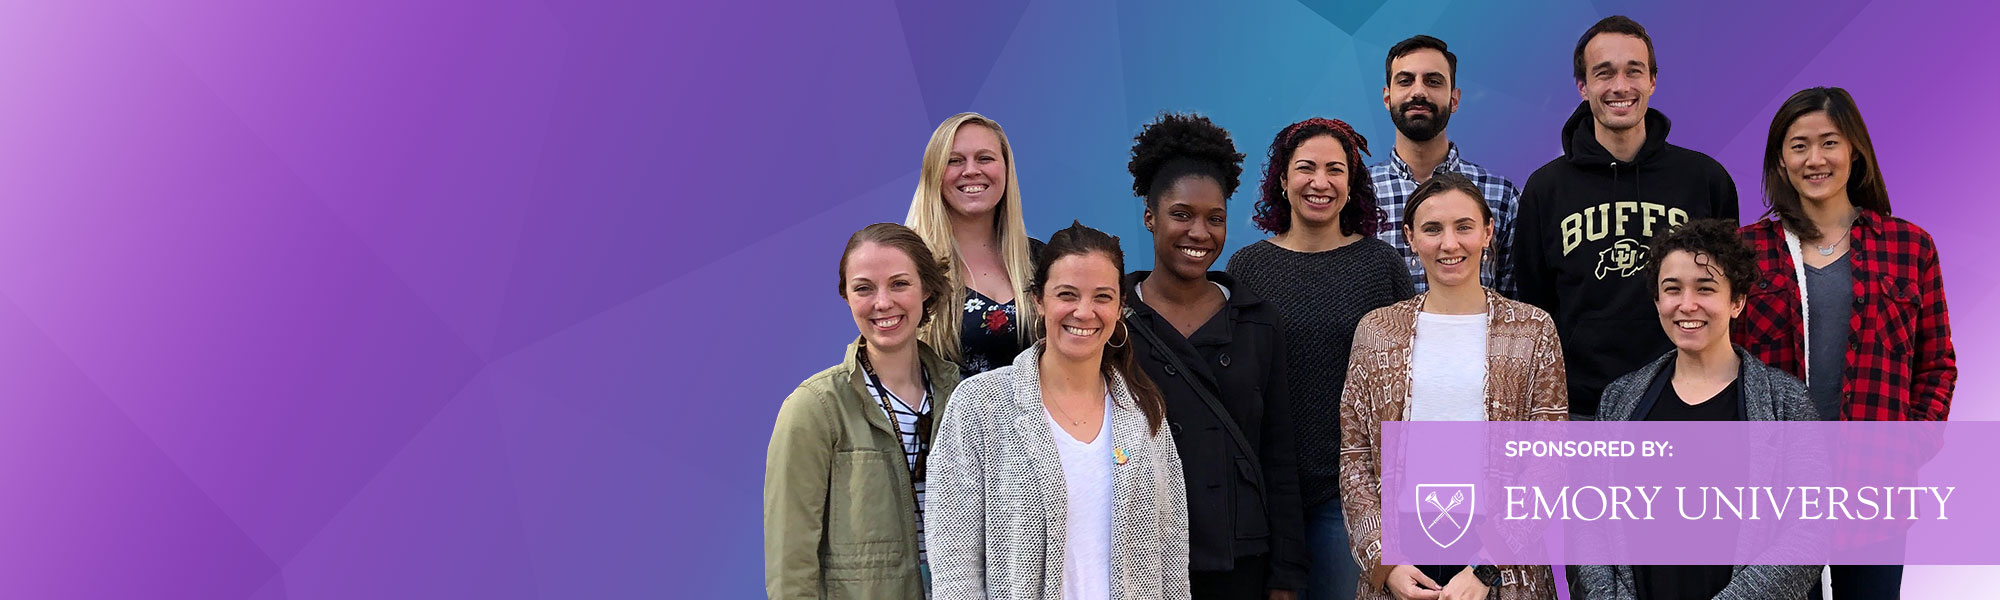 Science ATL Communication Fellowship (sponsored by Emory University) group photo